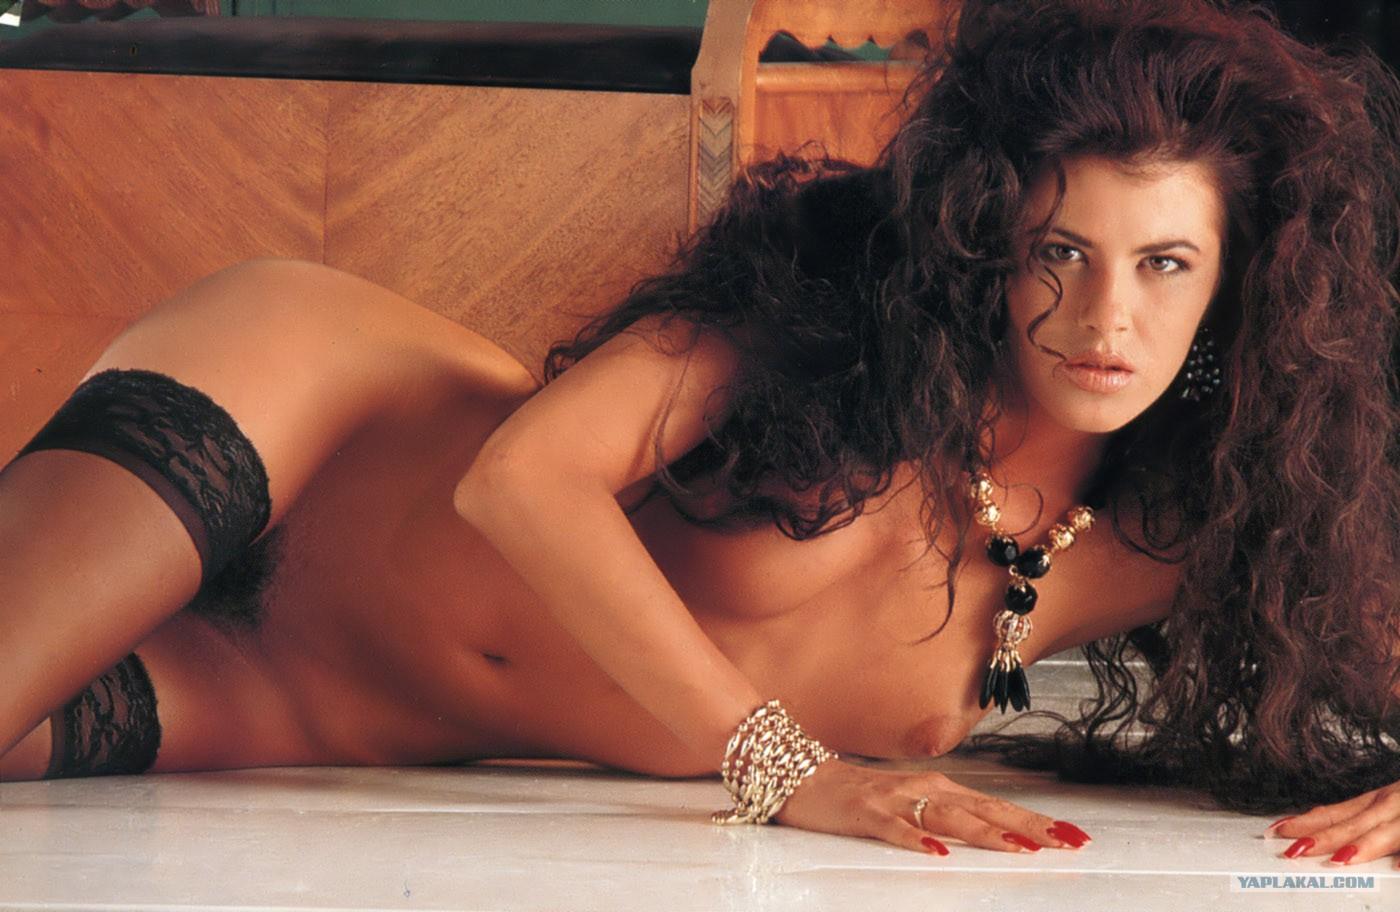 Уэлш порно актриса 3 фотография